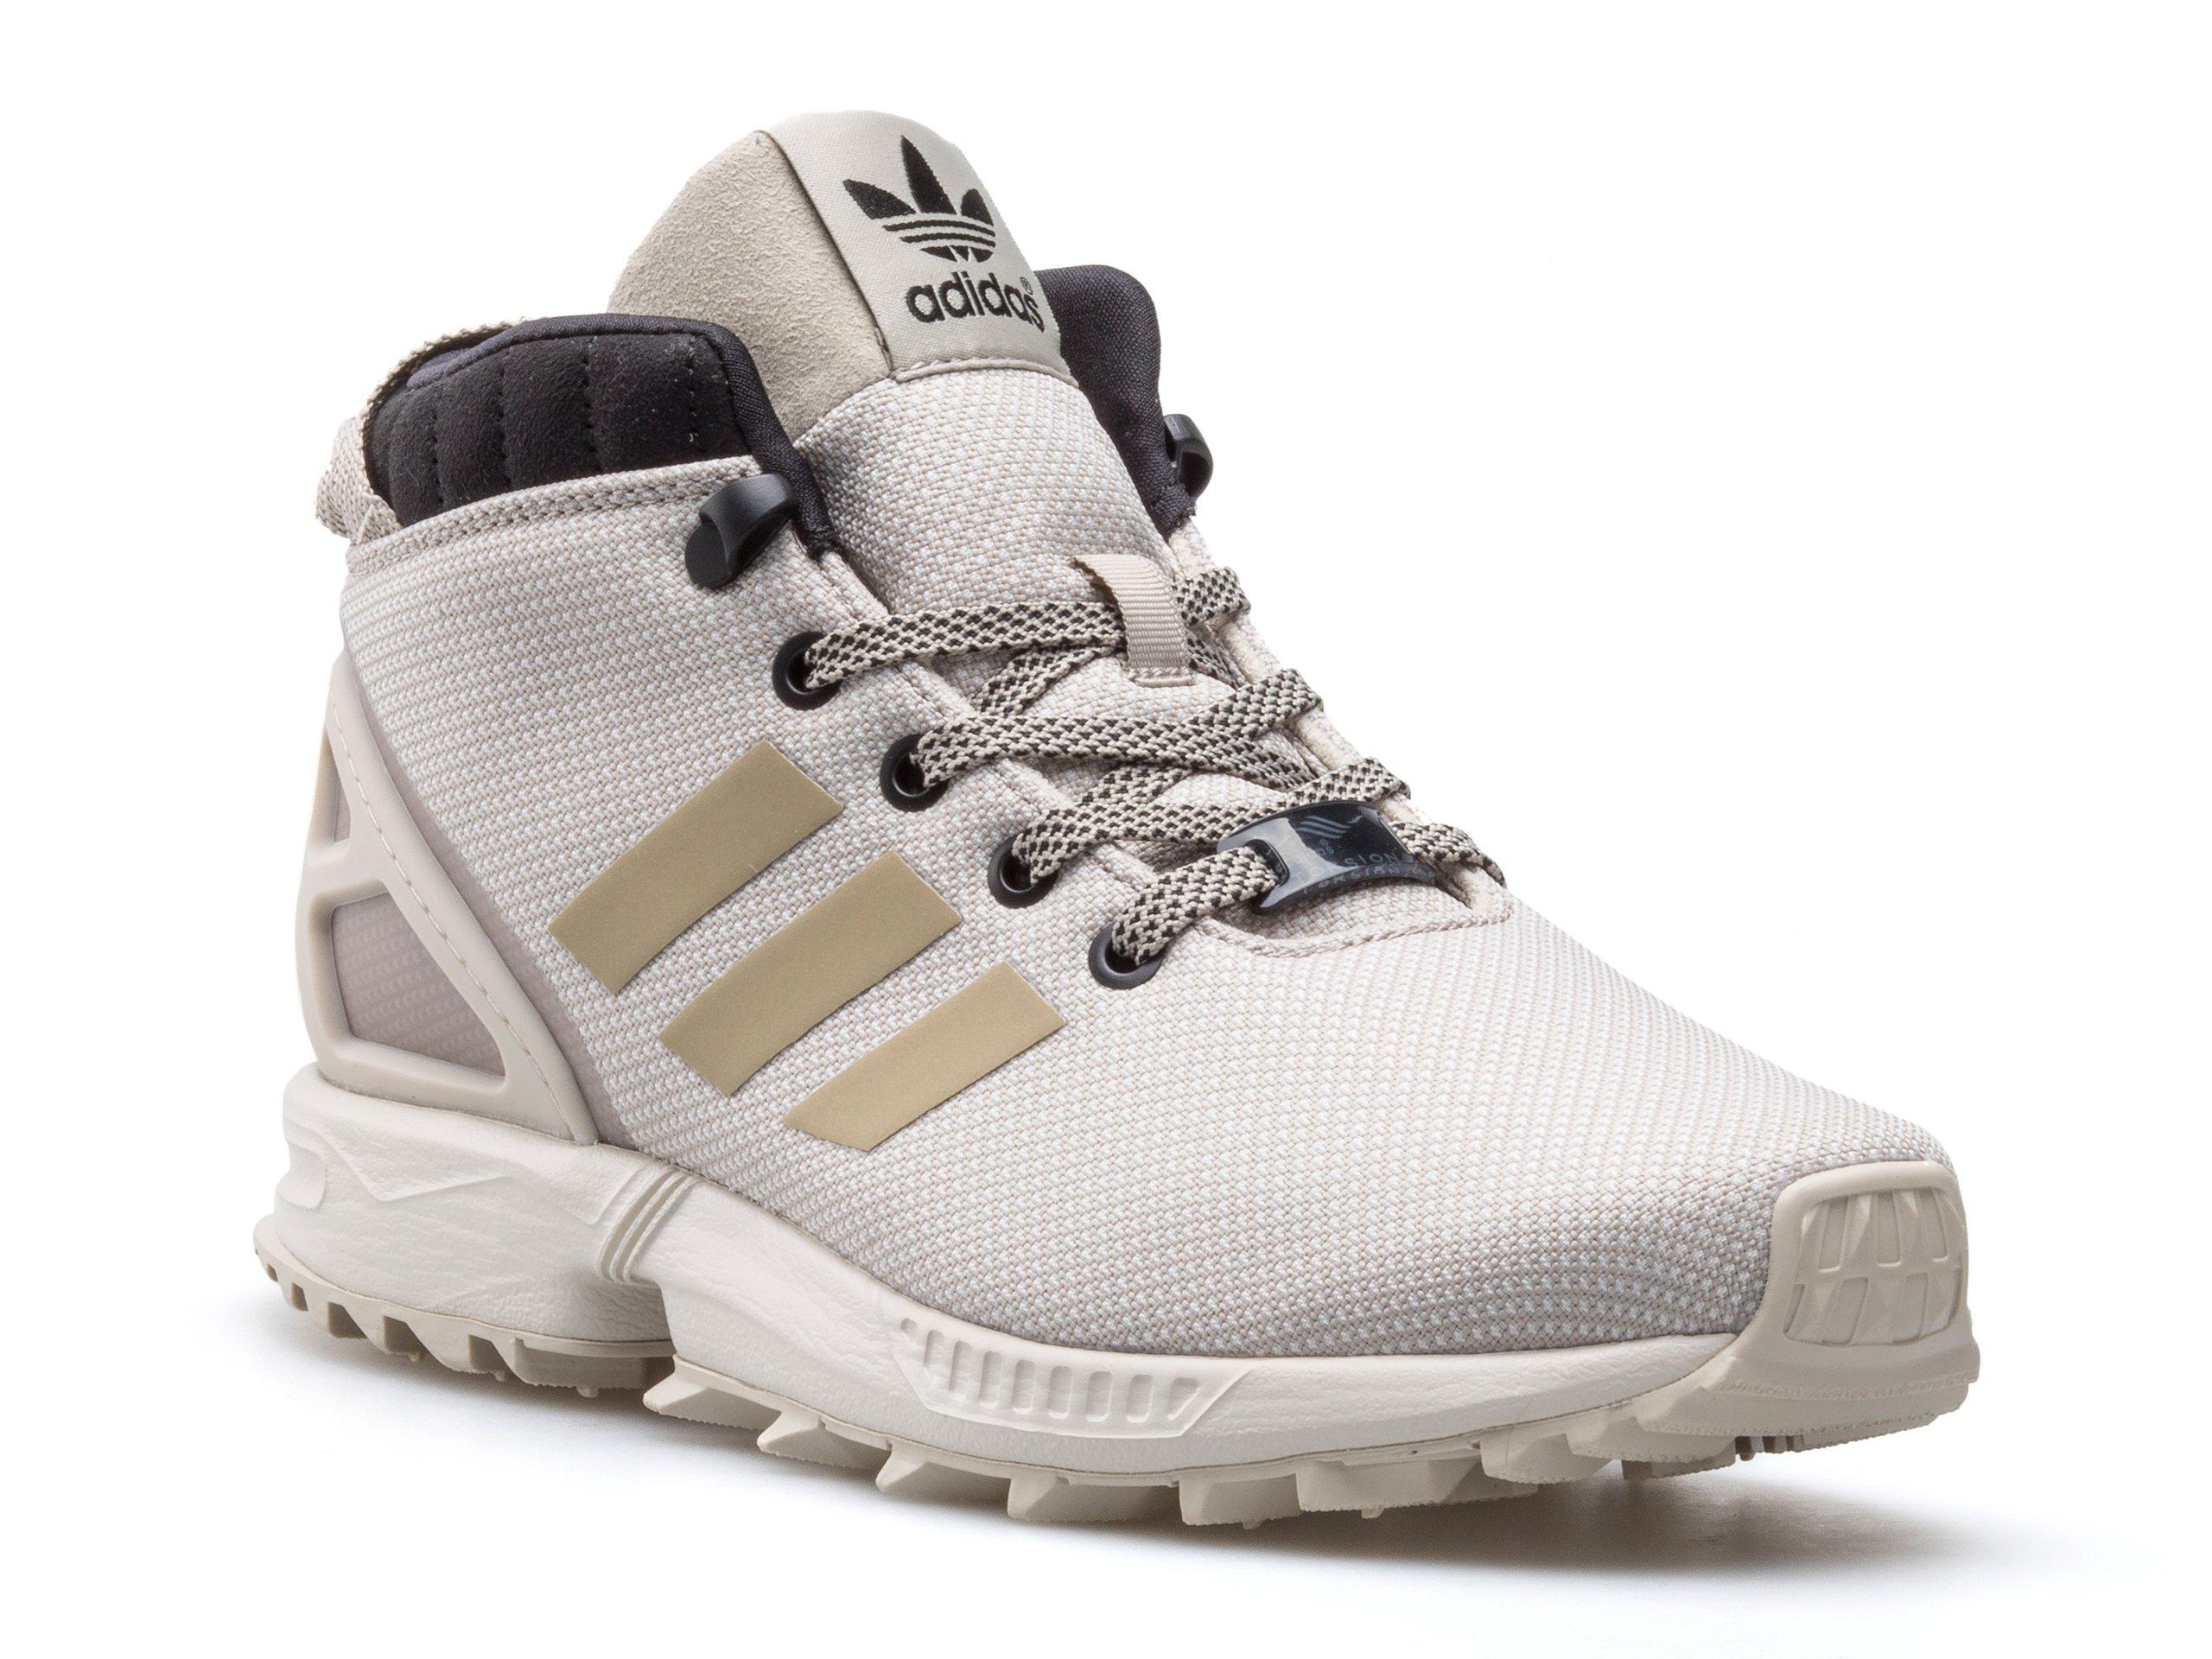 uk availability aab97 89774 ... italy buty mskie adidas zx flux 5 8 tr bb2203 r. 1 3 45 1